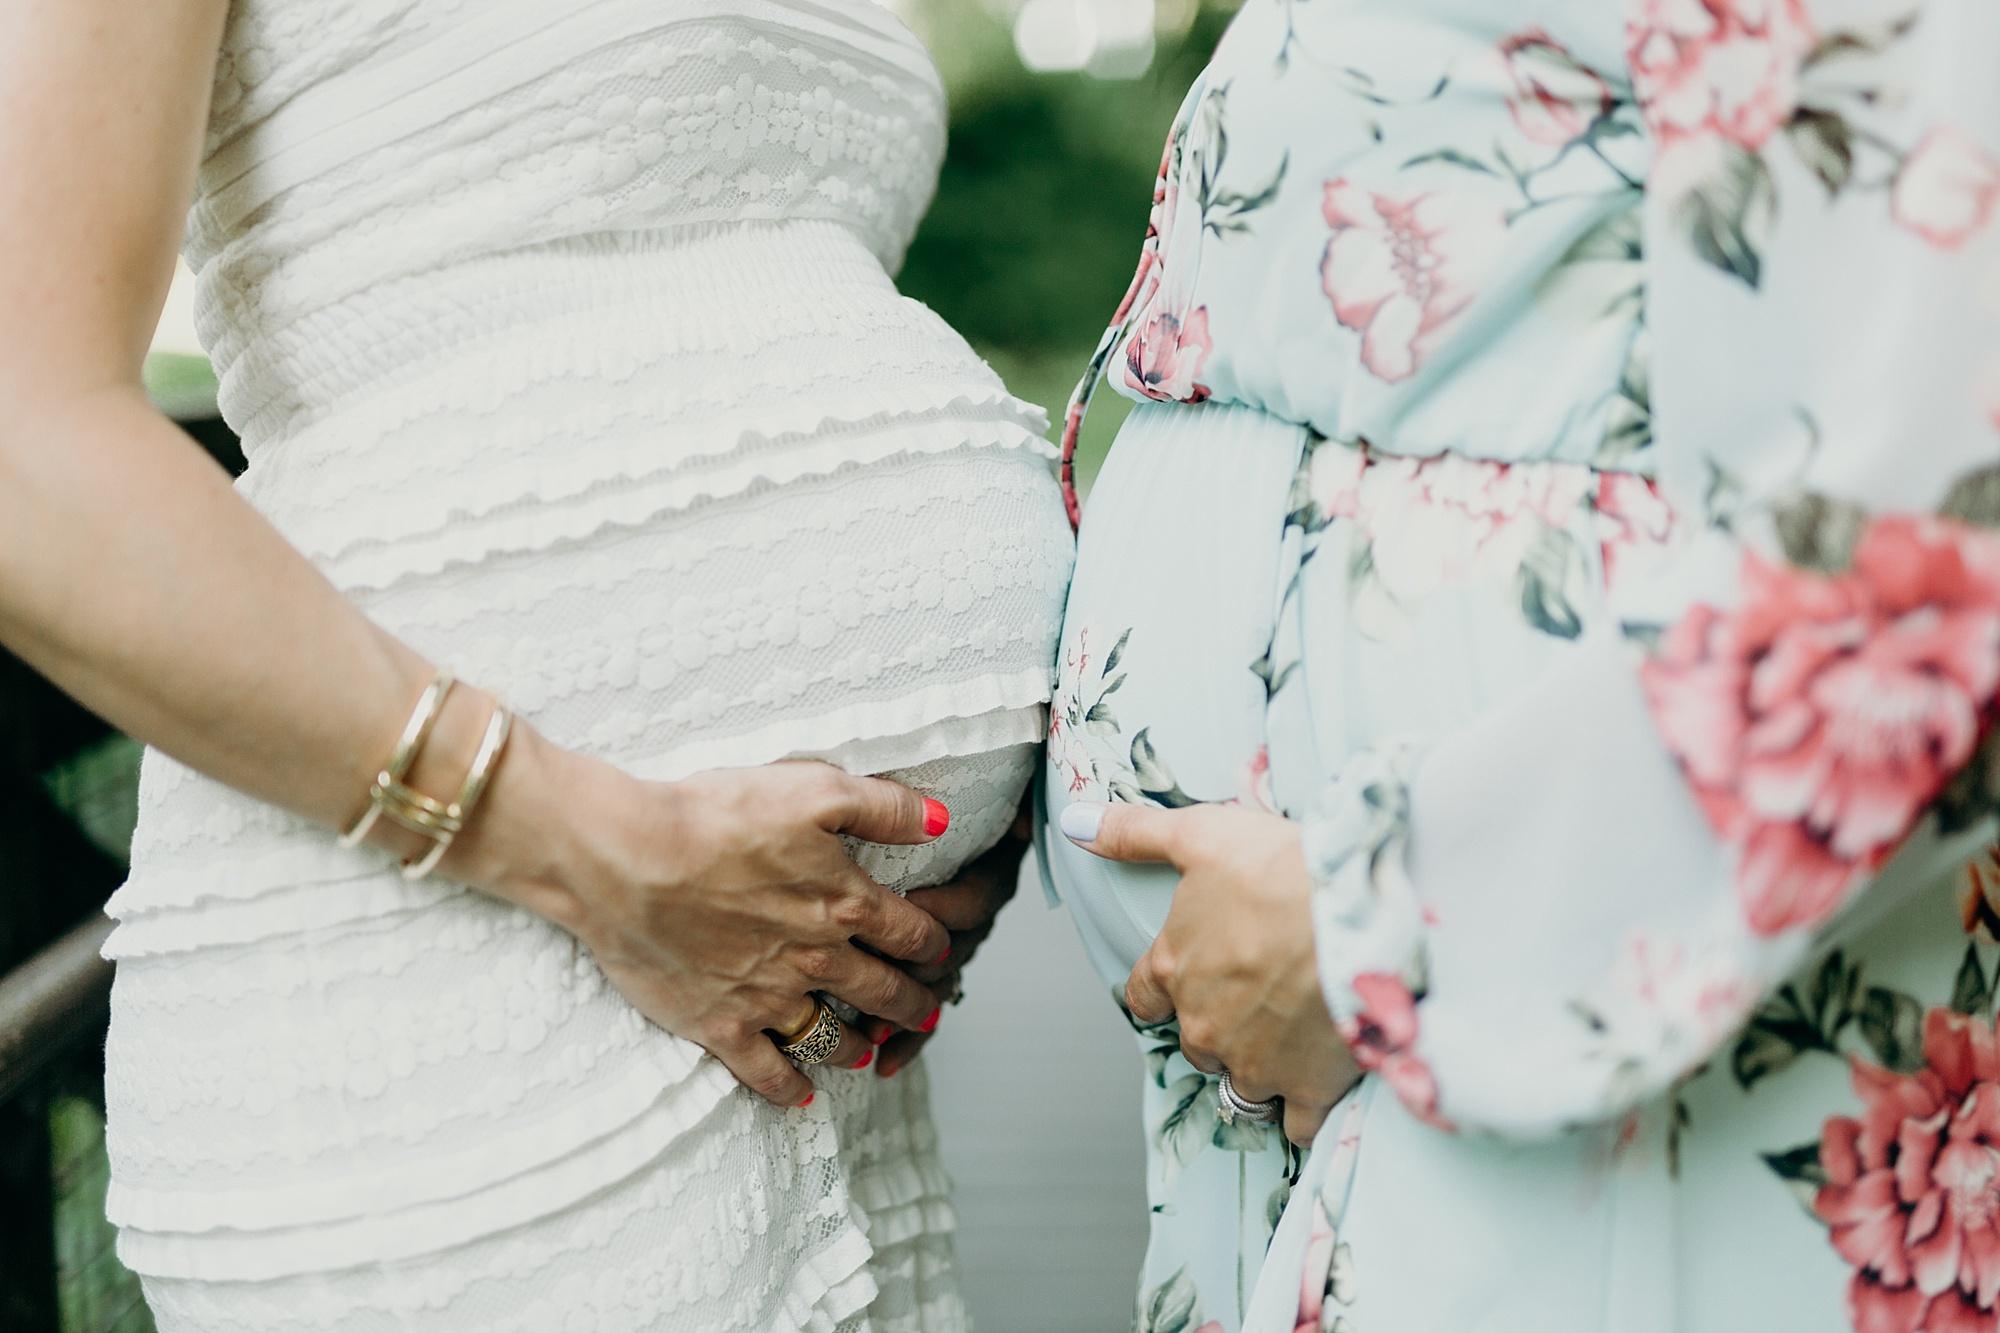 Joe_Mac_Creative_Maternity_West_Chester_Wedding_Photography_Philly_Best_Philadlephia__0143.jpg